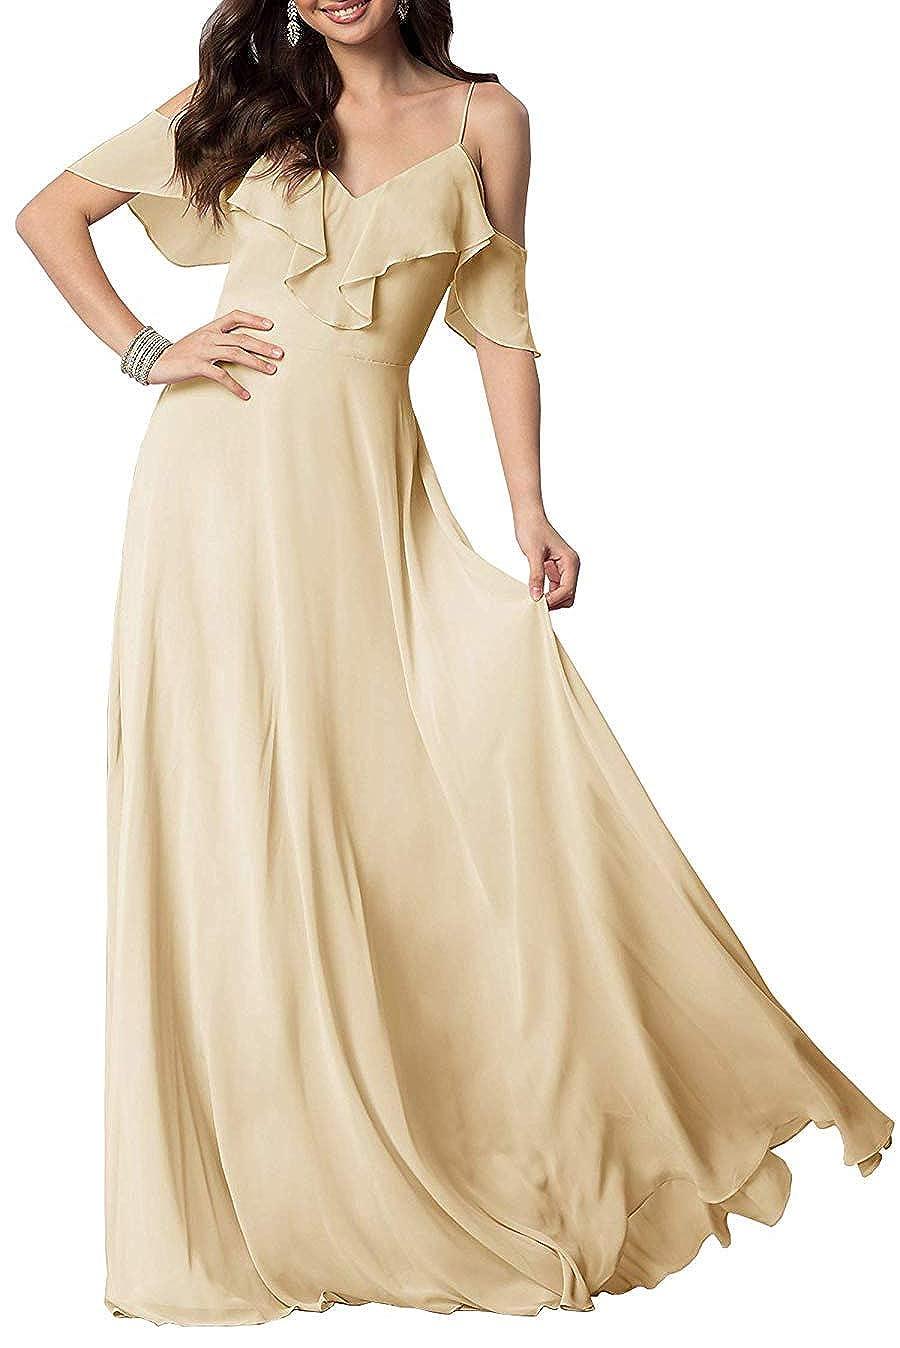 ChampagneA FeiYueXinXing VNeck Ruffled Spaghetti Strap Prom Dresses Long Formal Evening Gown